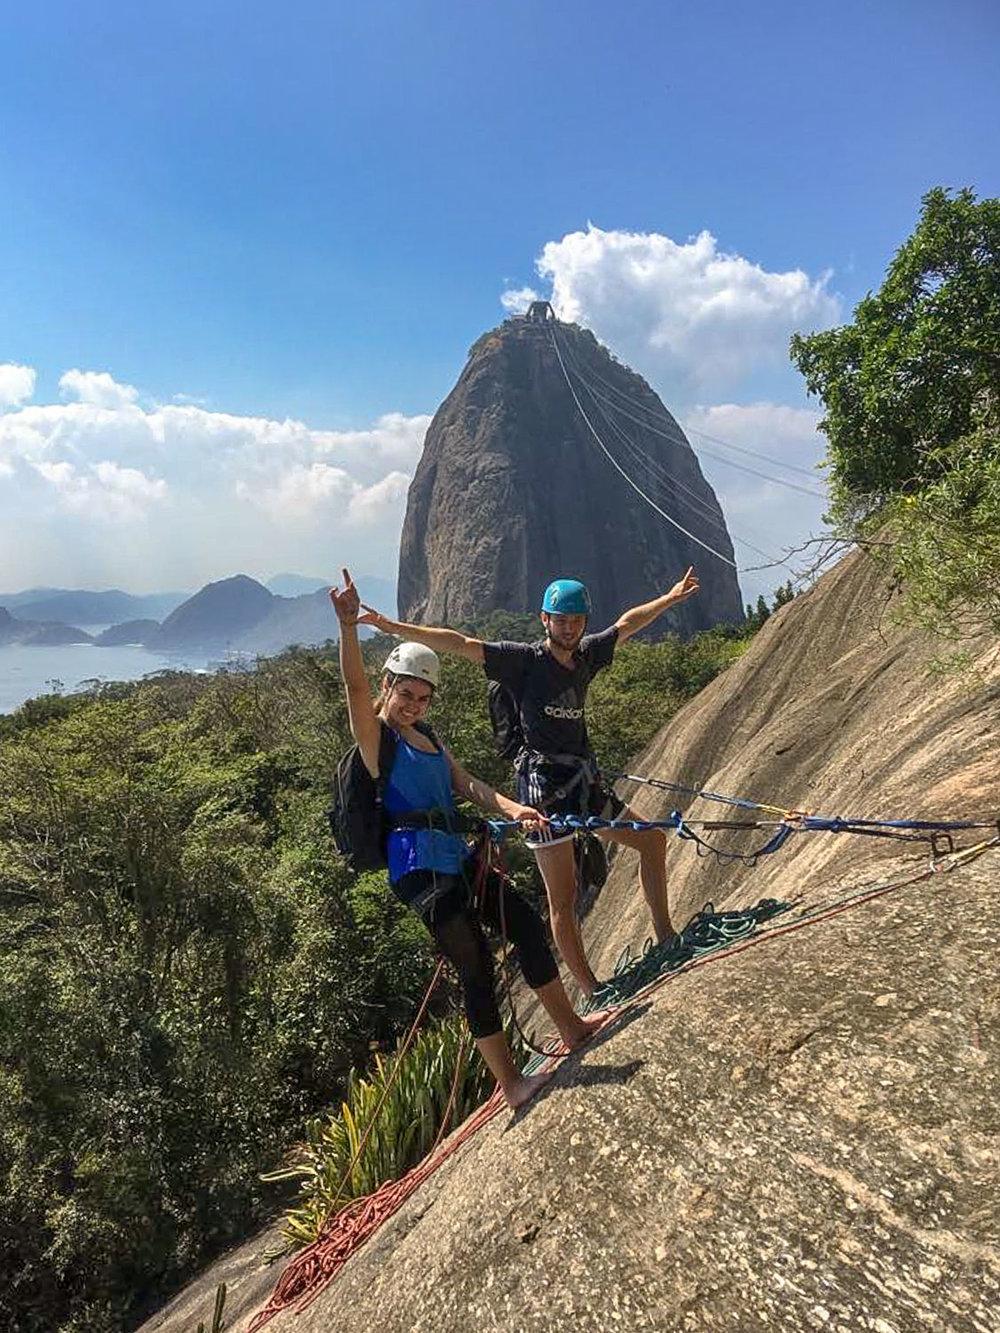 Guided rock climbing on Morro da Urca, Rio de Janeiro